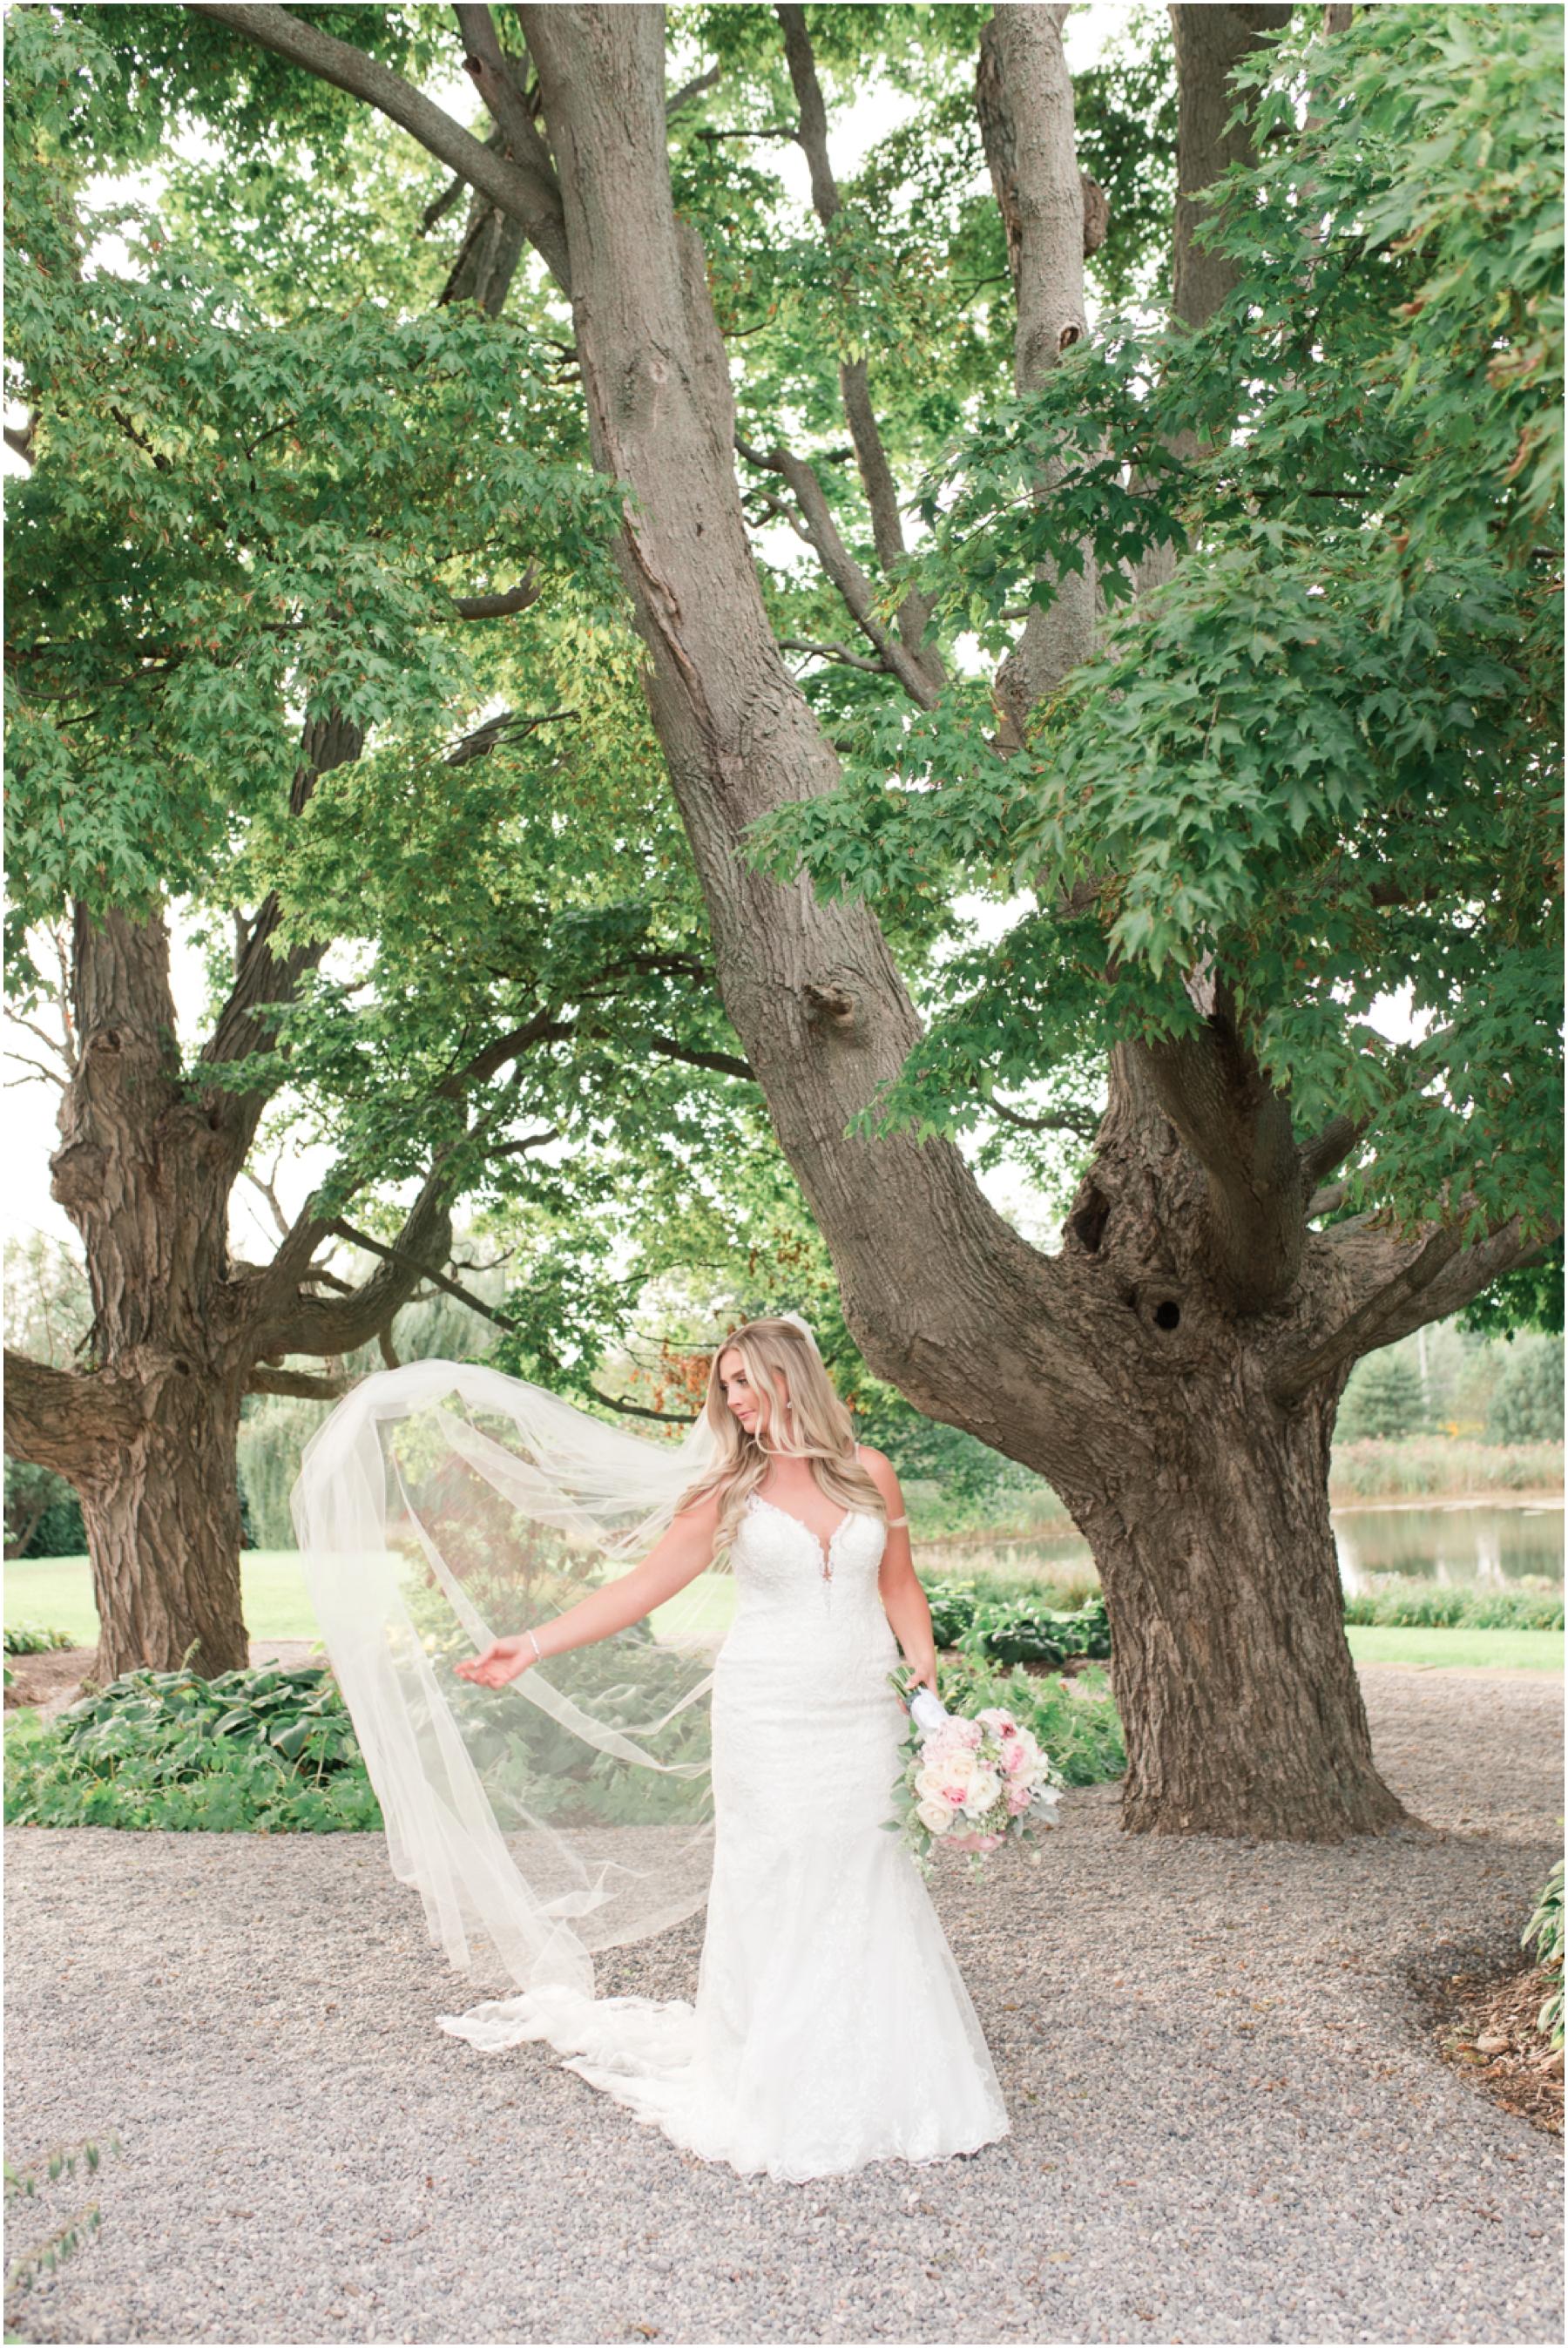 Bloom Field Gardens Wedding Precious Photography Katherine & Chris_067